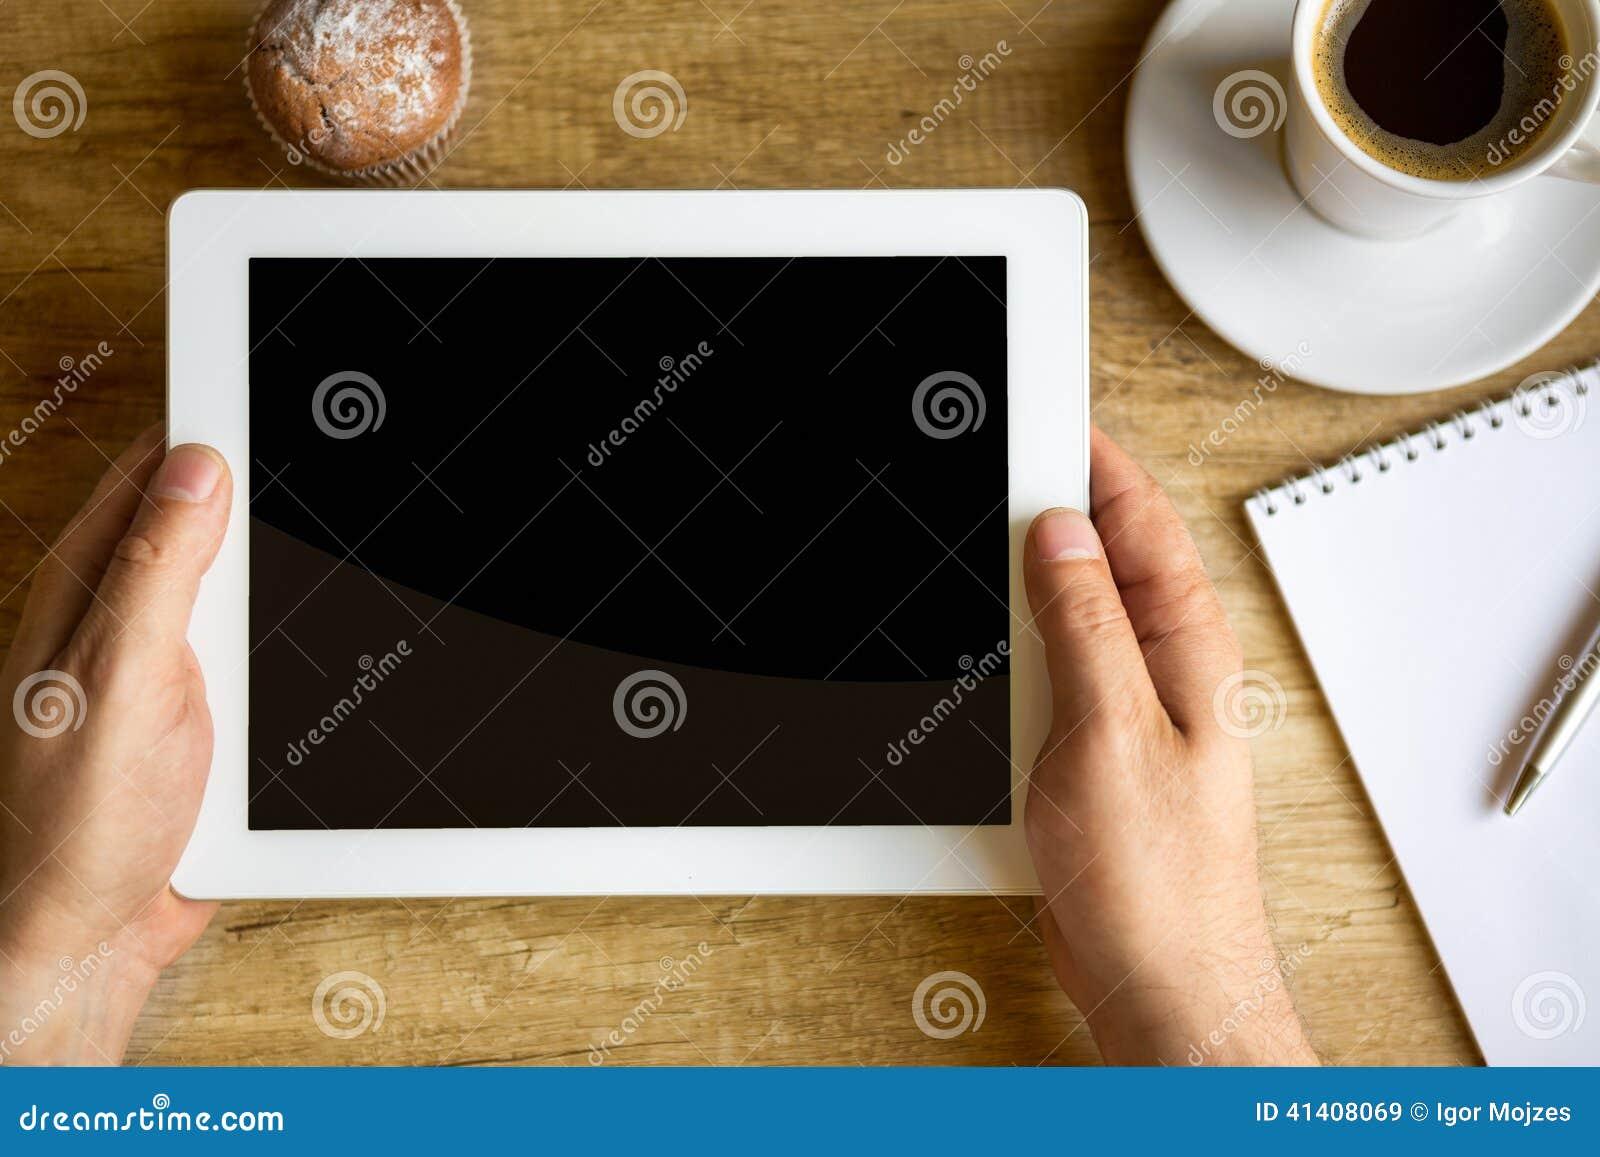 coffee break royalty free stock image 32833846. Black Bedroom Furniture Sets. Home Design Ideas